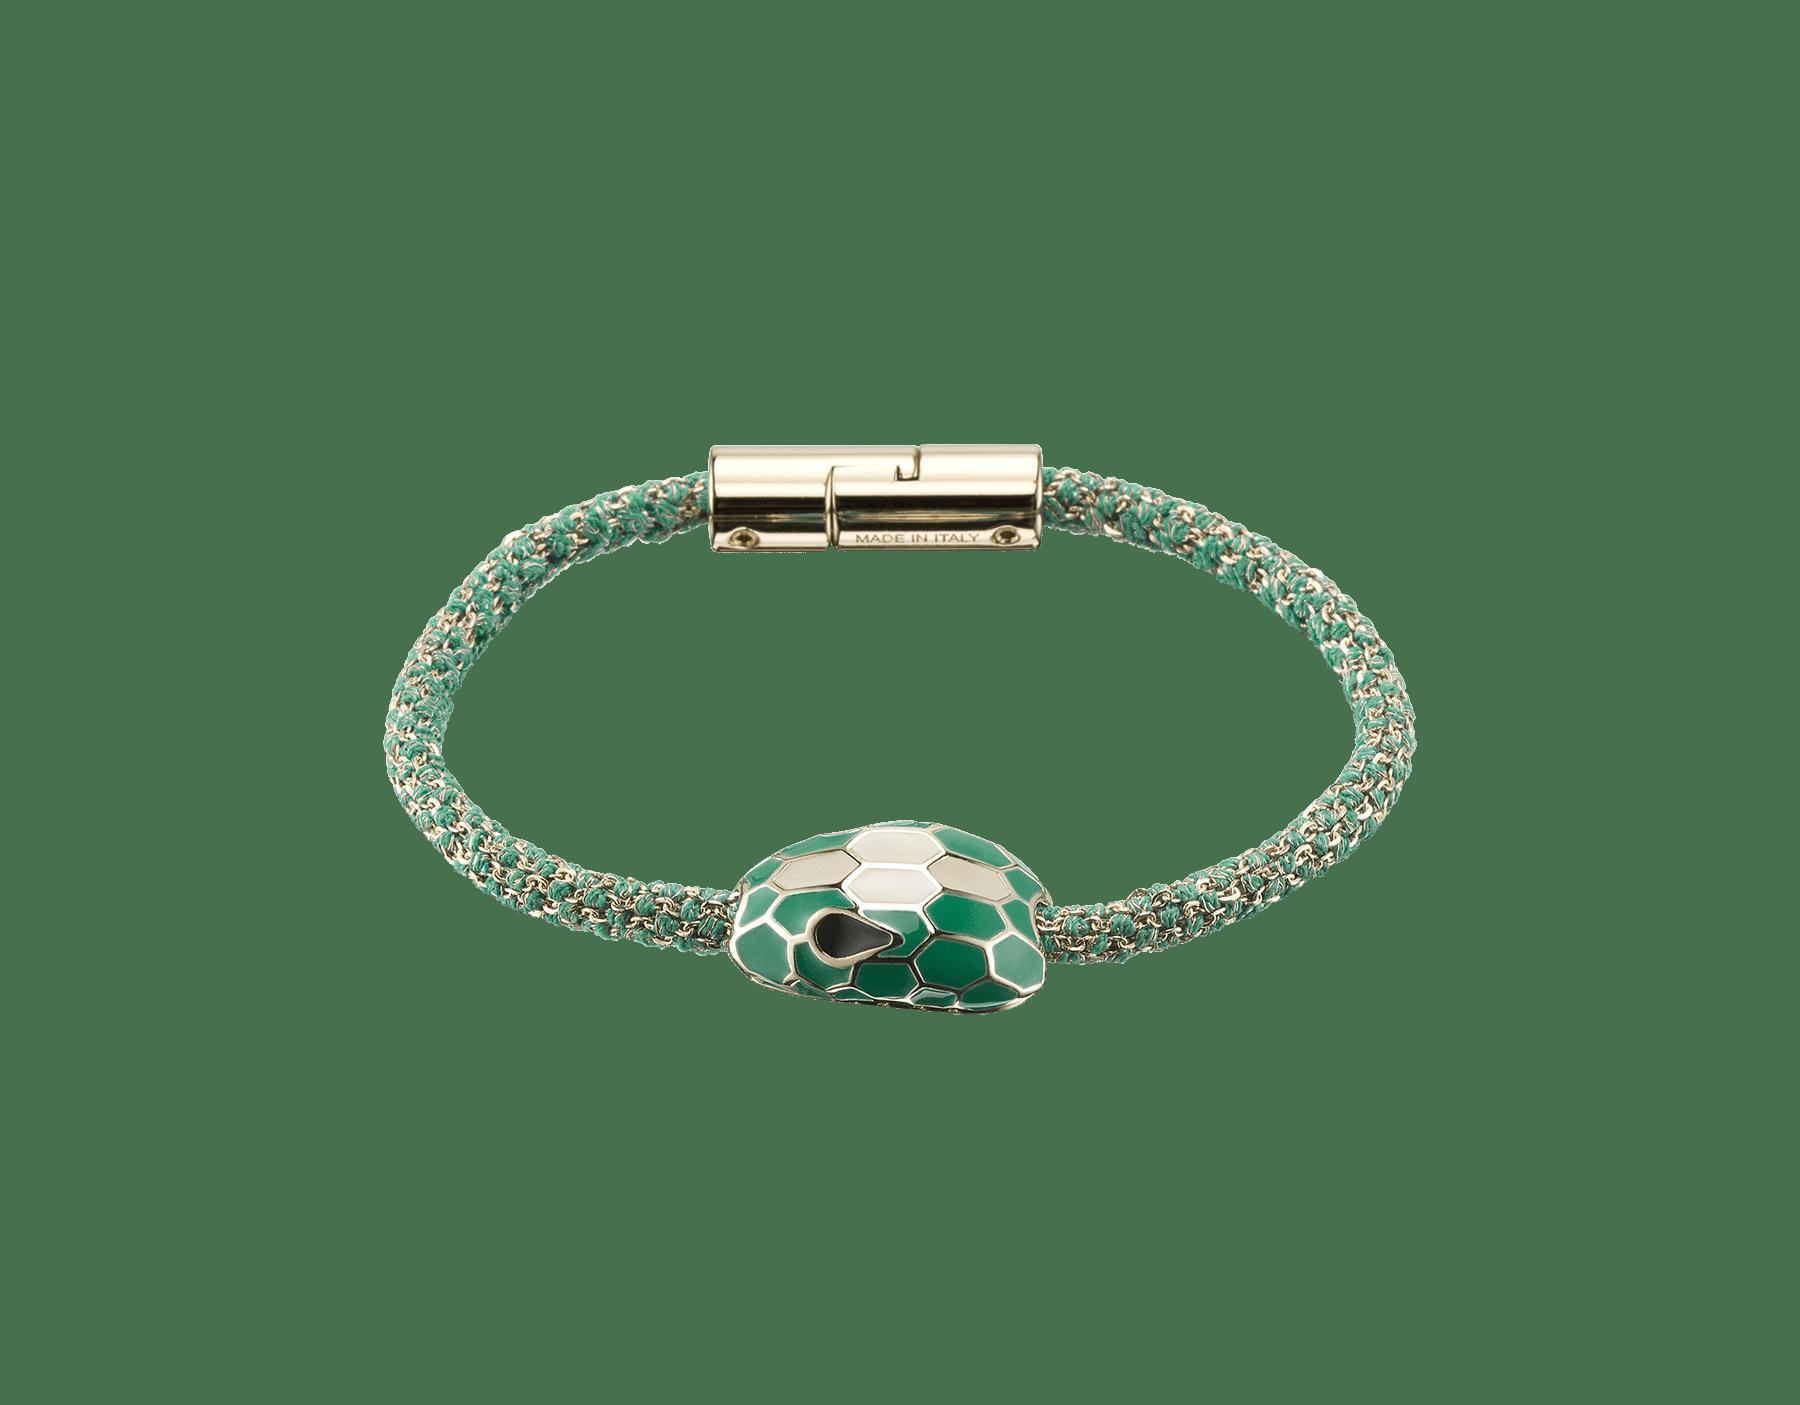 Serpenti Forever 手環,祖母綠色金屬光澤絲質編織繩帶,經典蛇頭元素飾以白色和祖母綠色琺瑯。 RollingChain-S-EG image 2